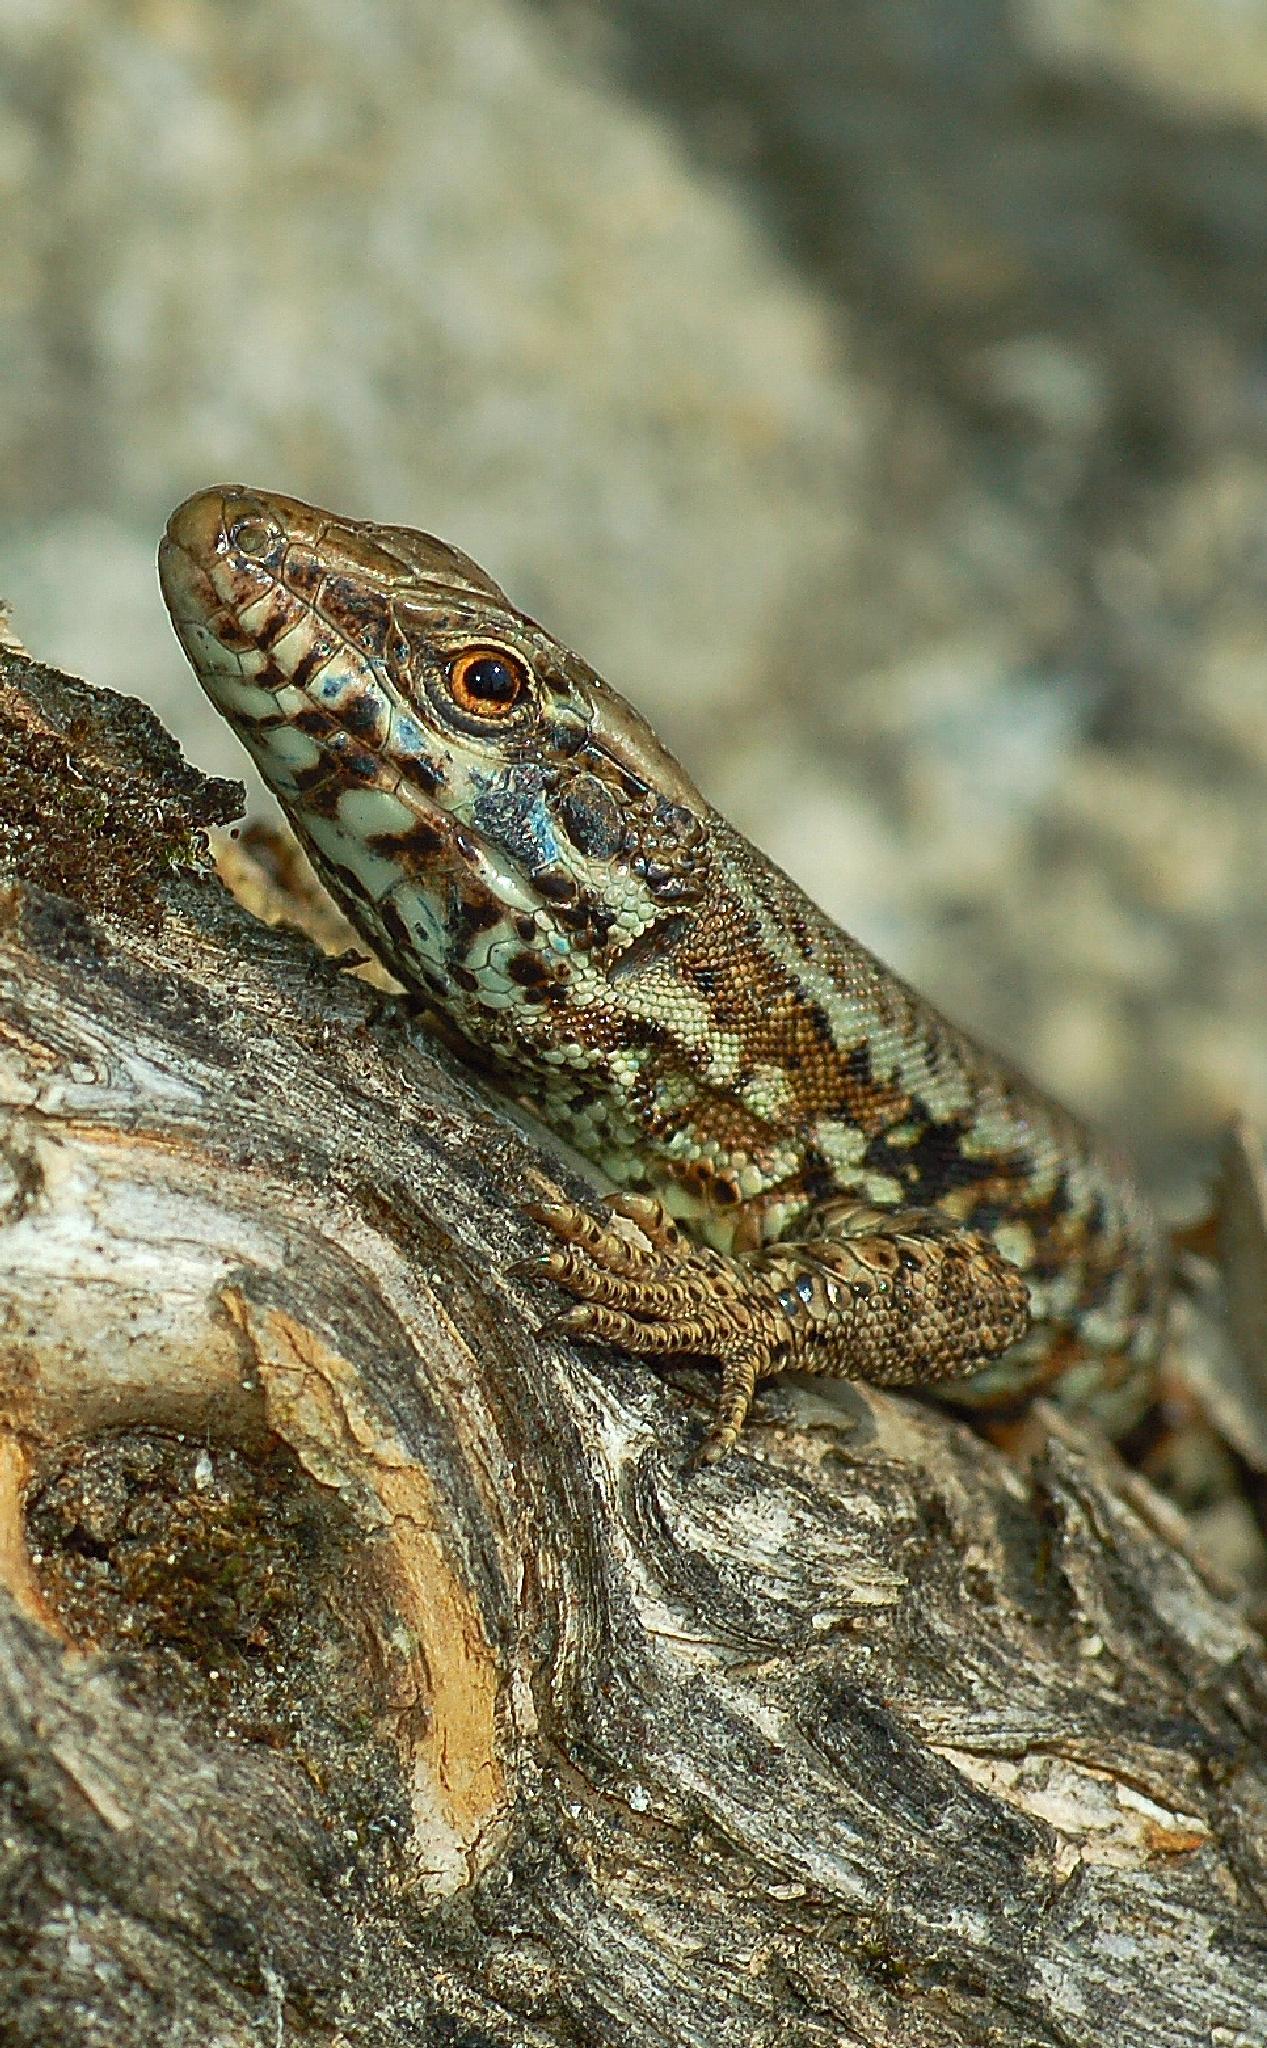 Lizard by Phif60